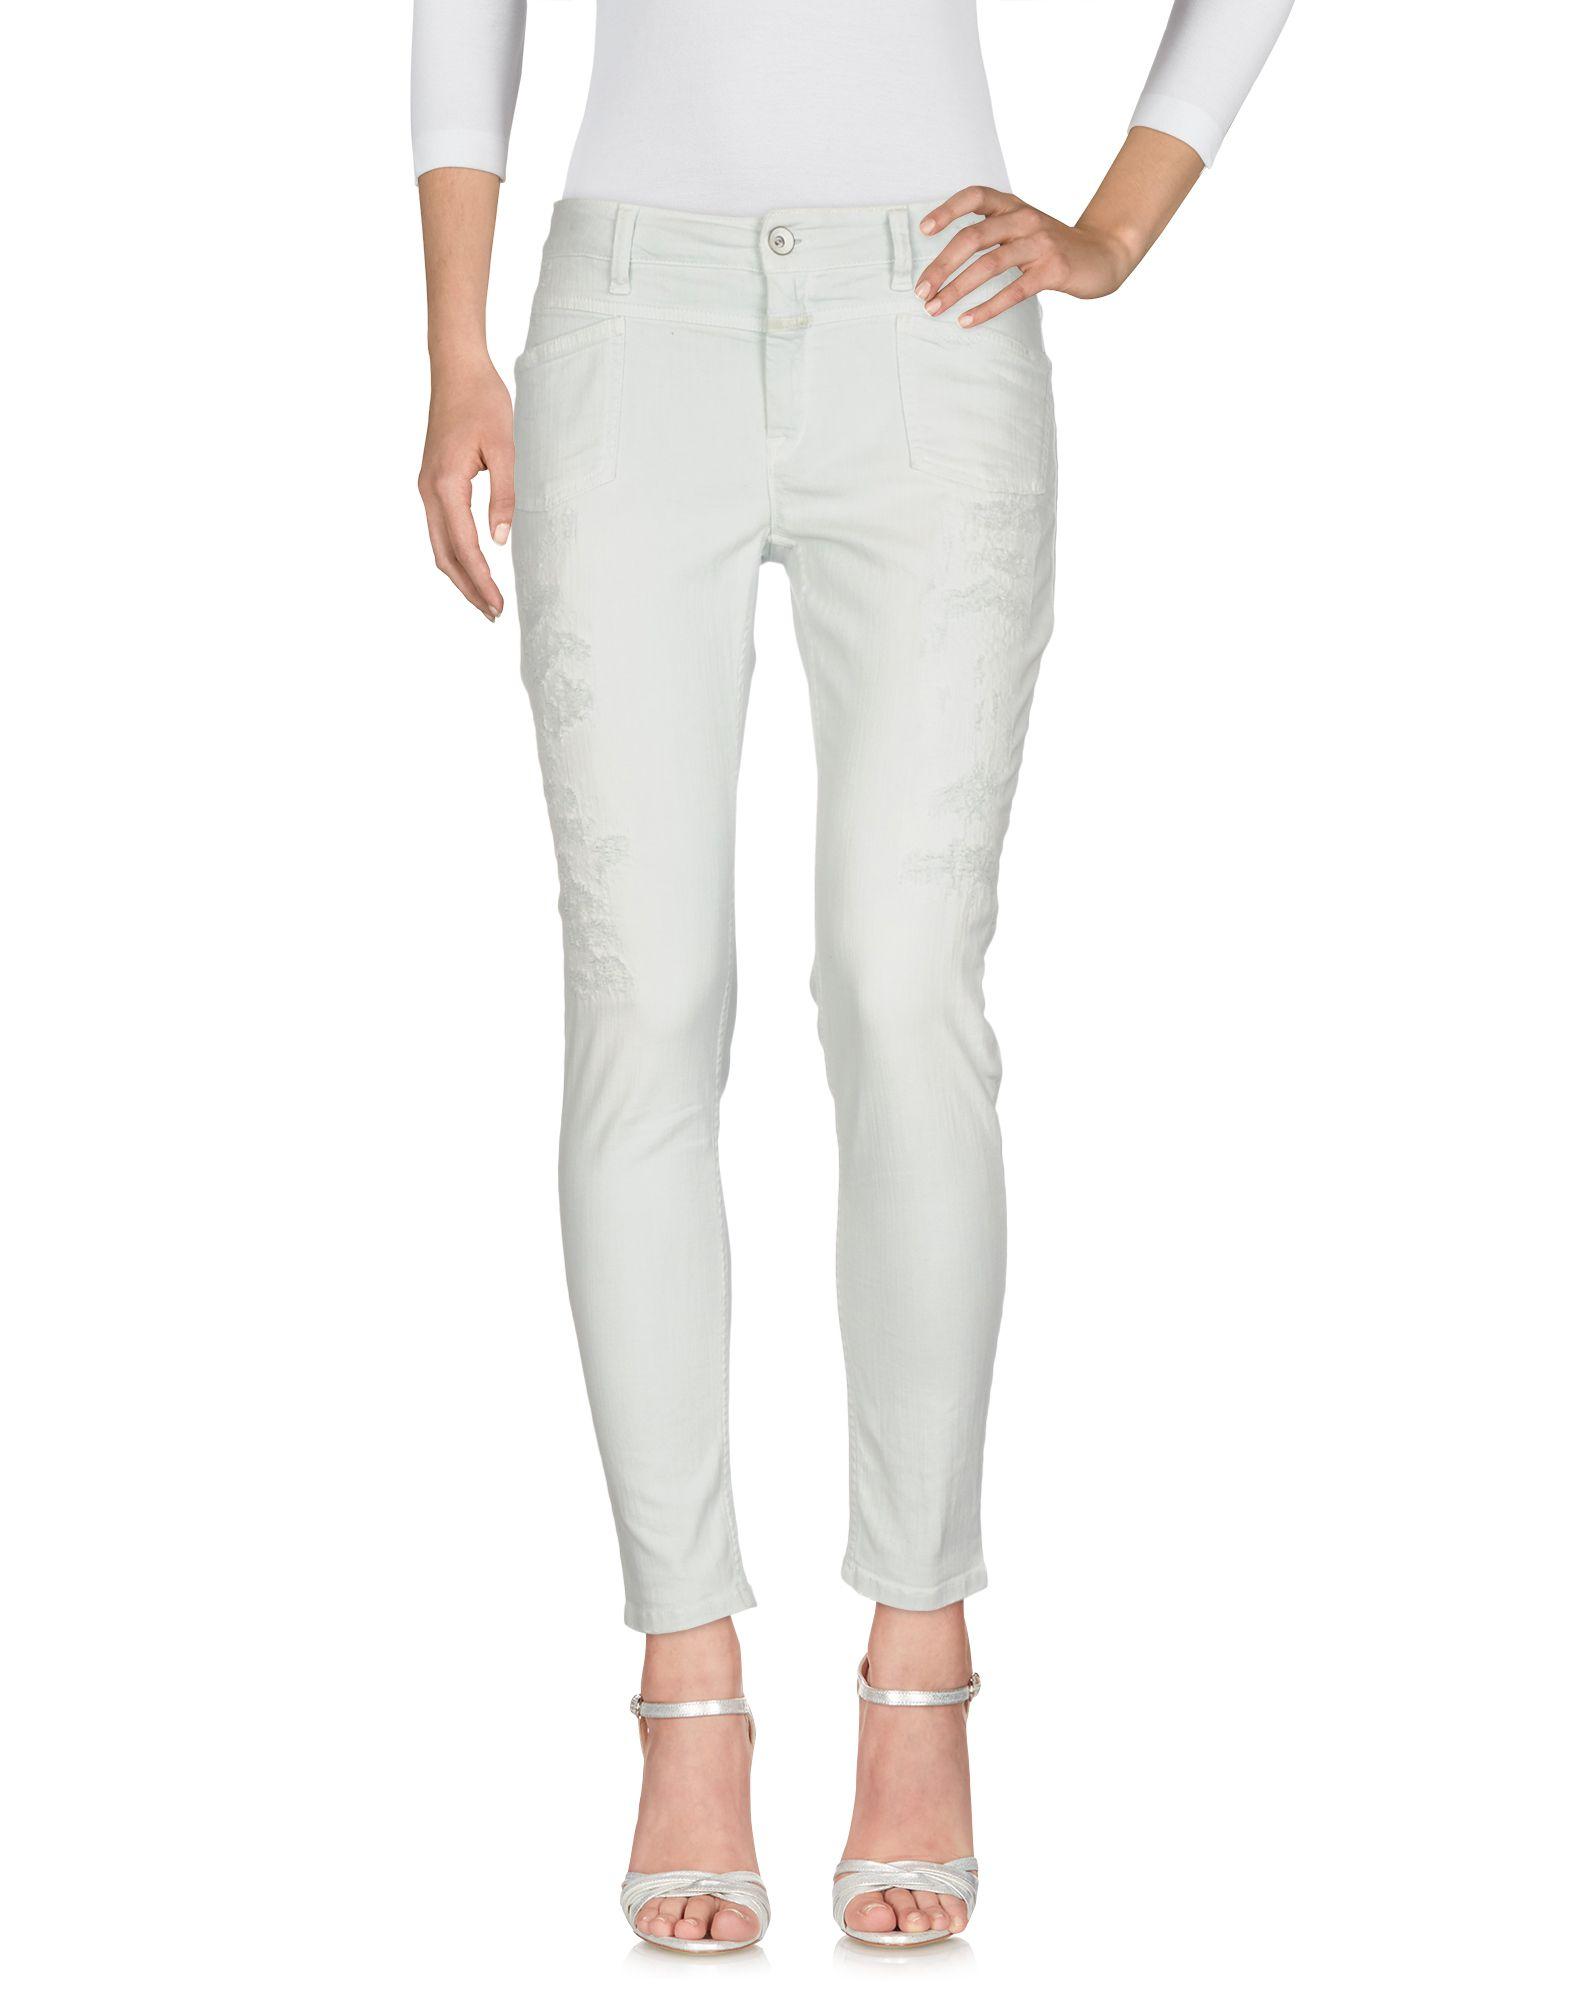 CLOSED Damen Jeanshose Farbe Himmelblau Größe 6